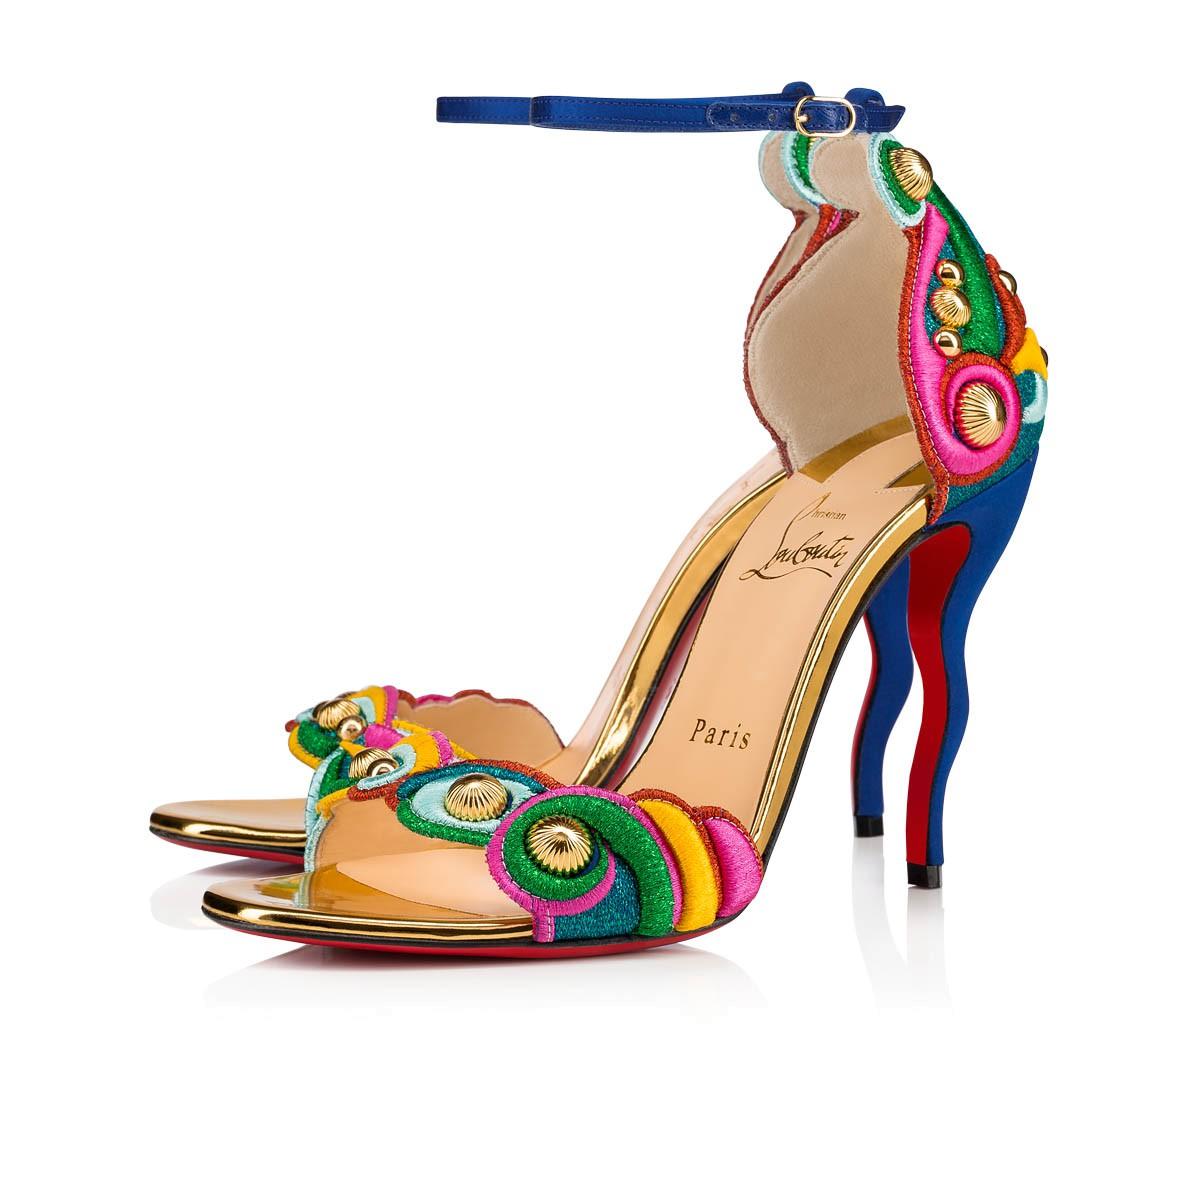 Shoes - Bhutanika - Christian Louboutin